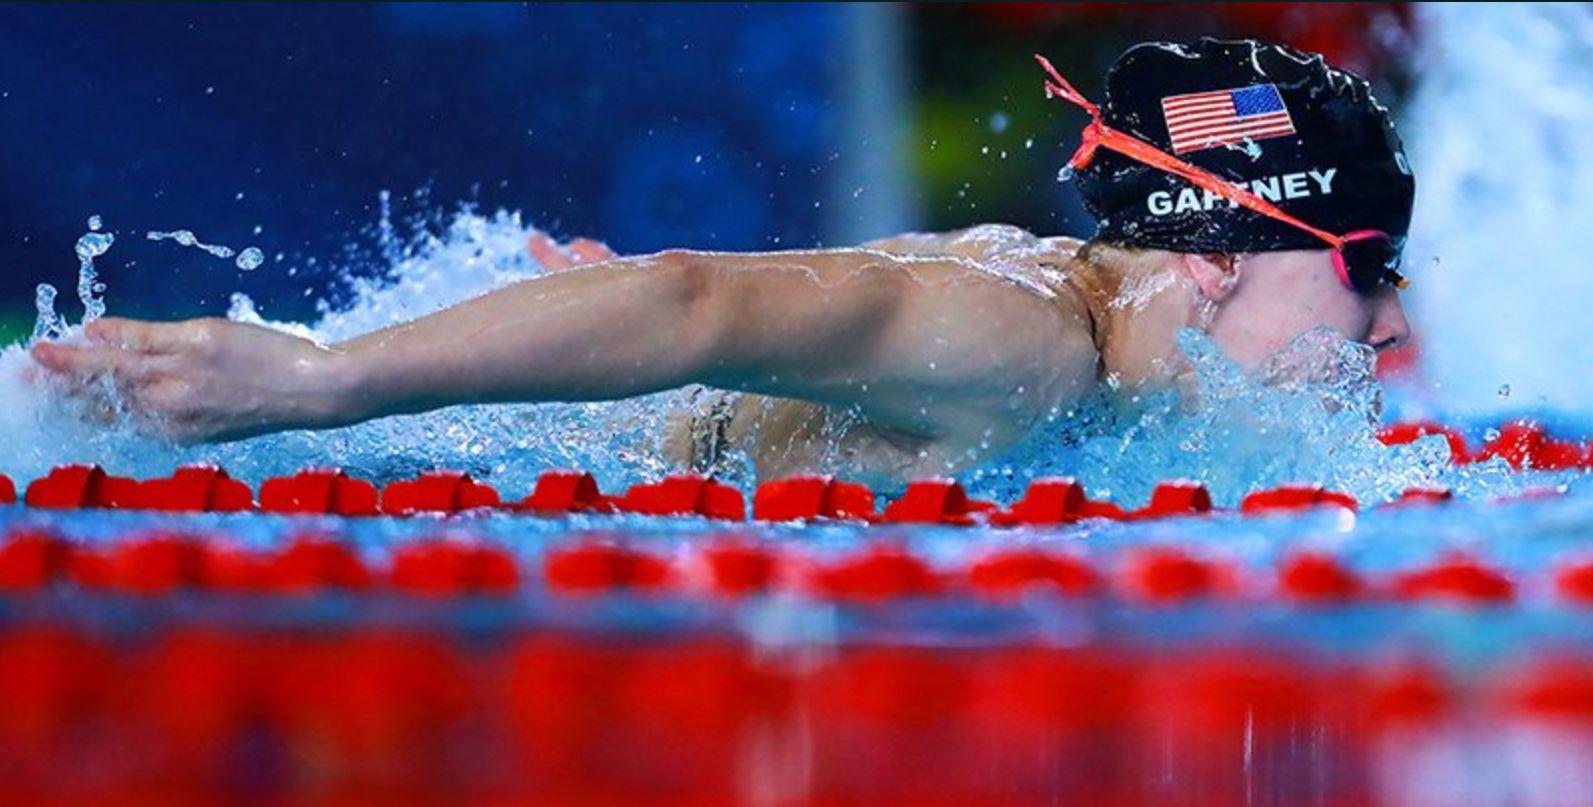 Julia Gaffney Opens 2019 World Para Swimming World Series with S7 100 Back World Record - Swimming World News